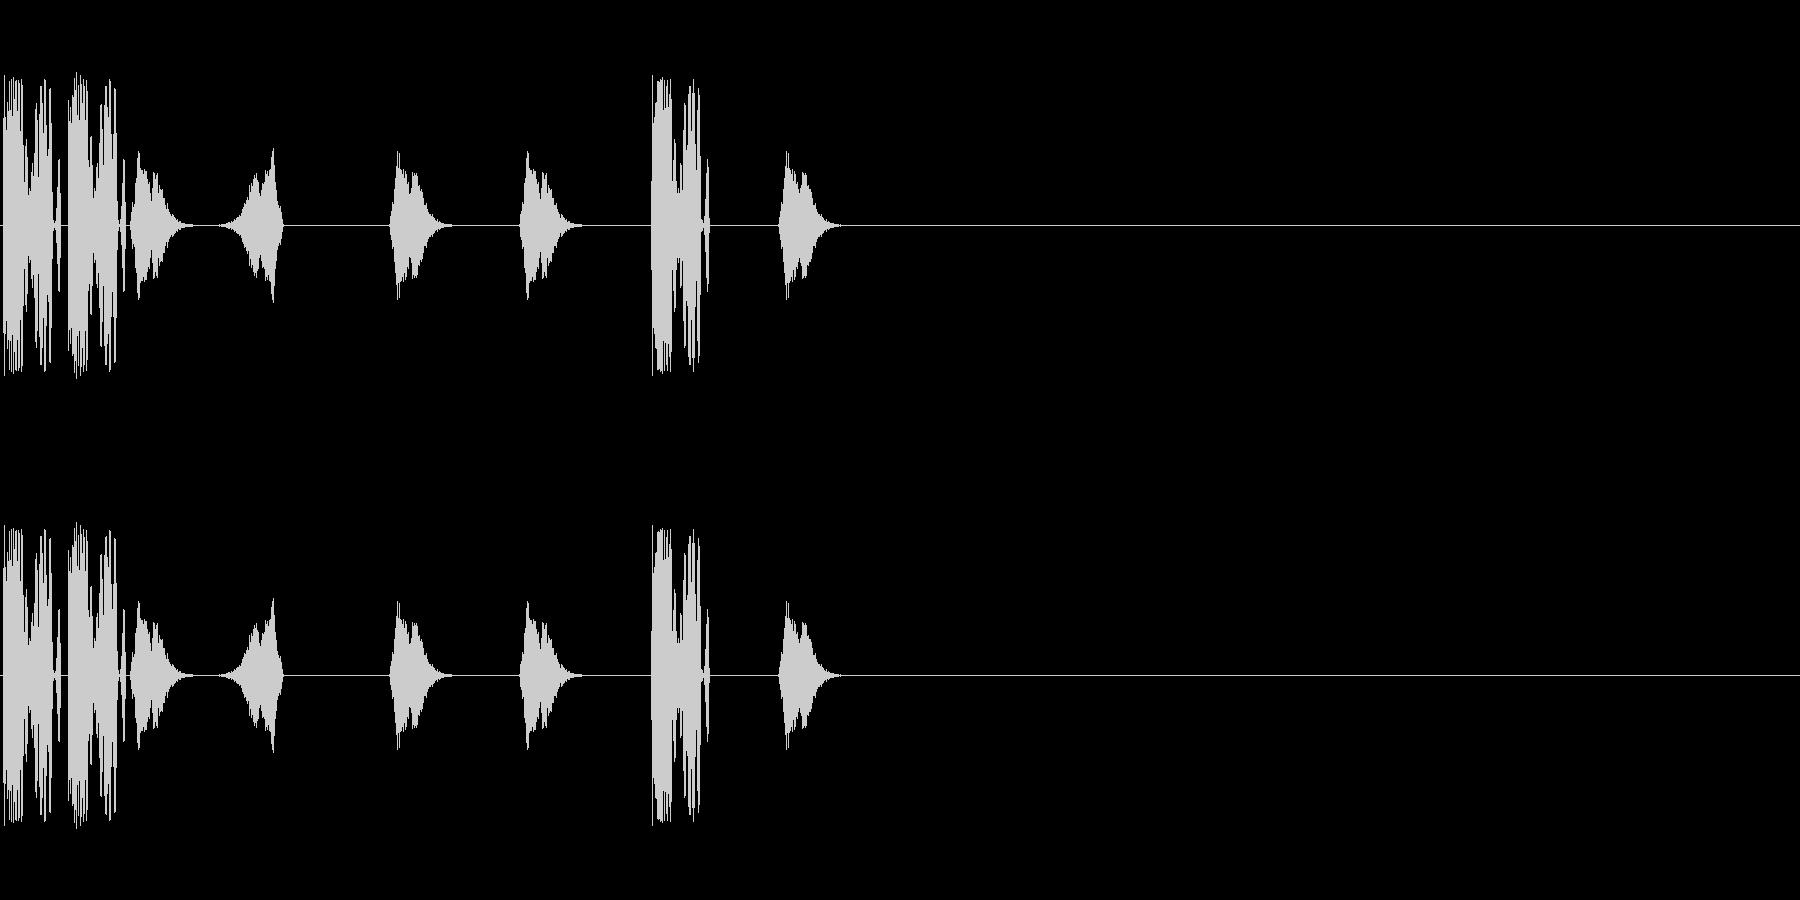 DJスクラッチ/ターンテーブル/E-16の未再生の波形